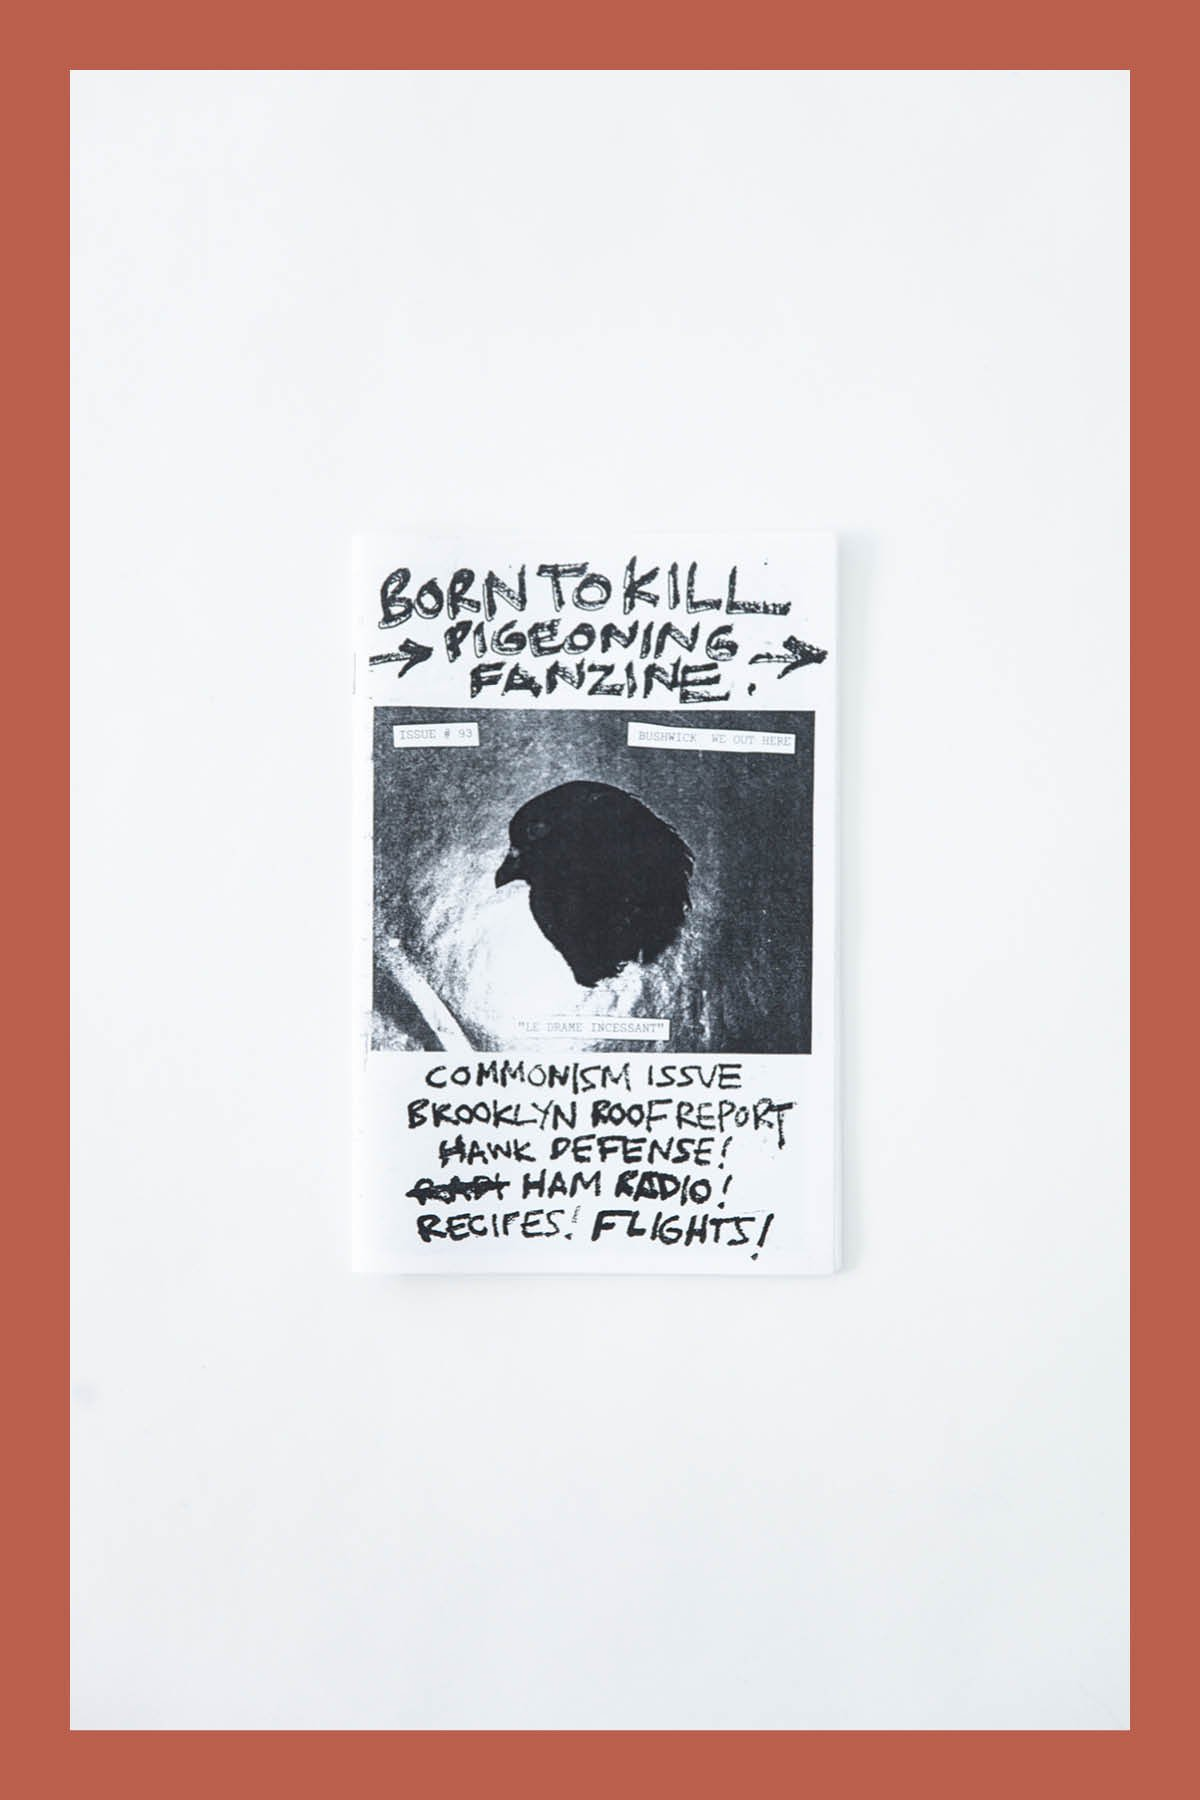 Pat McCarthy / BORN TO KILL ZINE #93